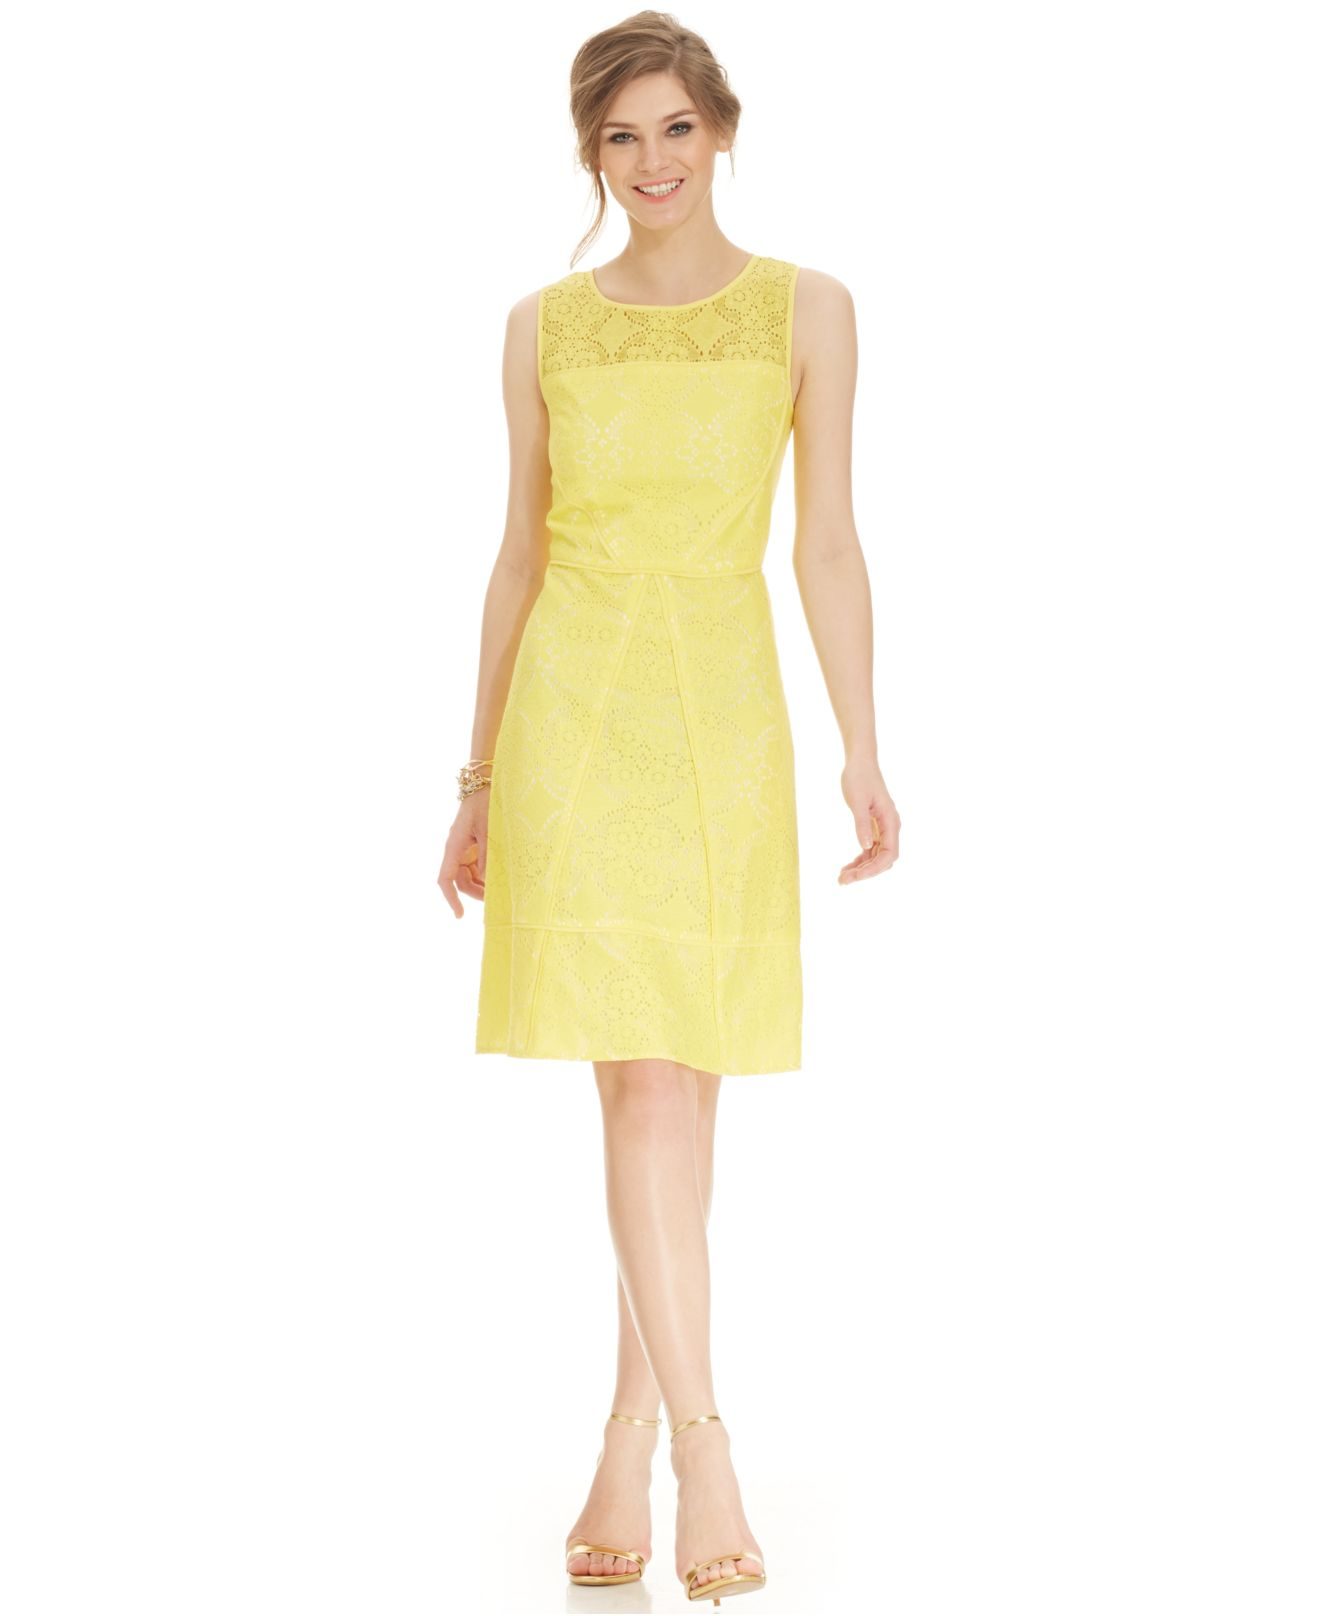 Lyst - Adrianna Papell Sleeveless Illusion-Yoke Lace Dress in Yellow